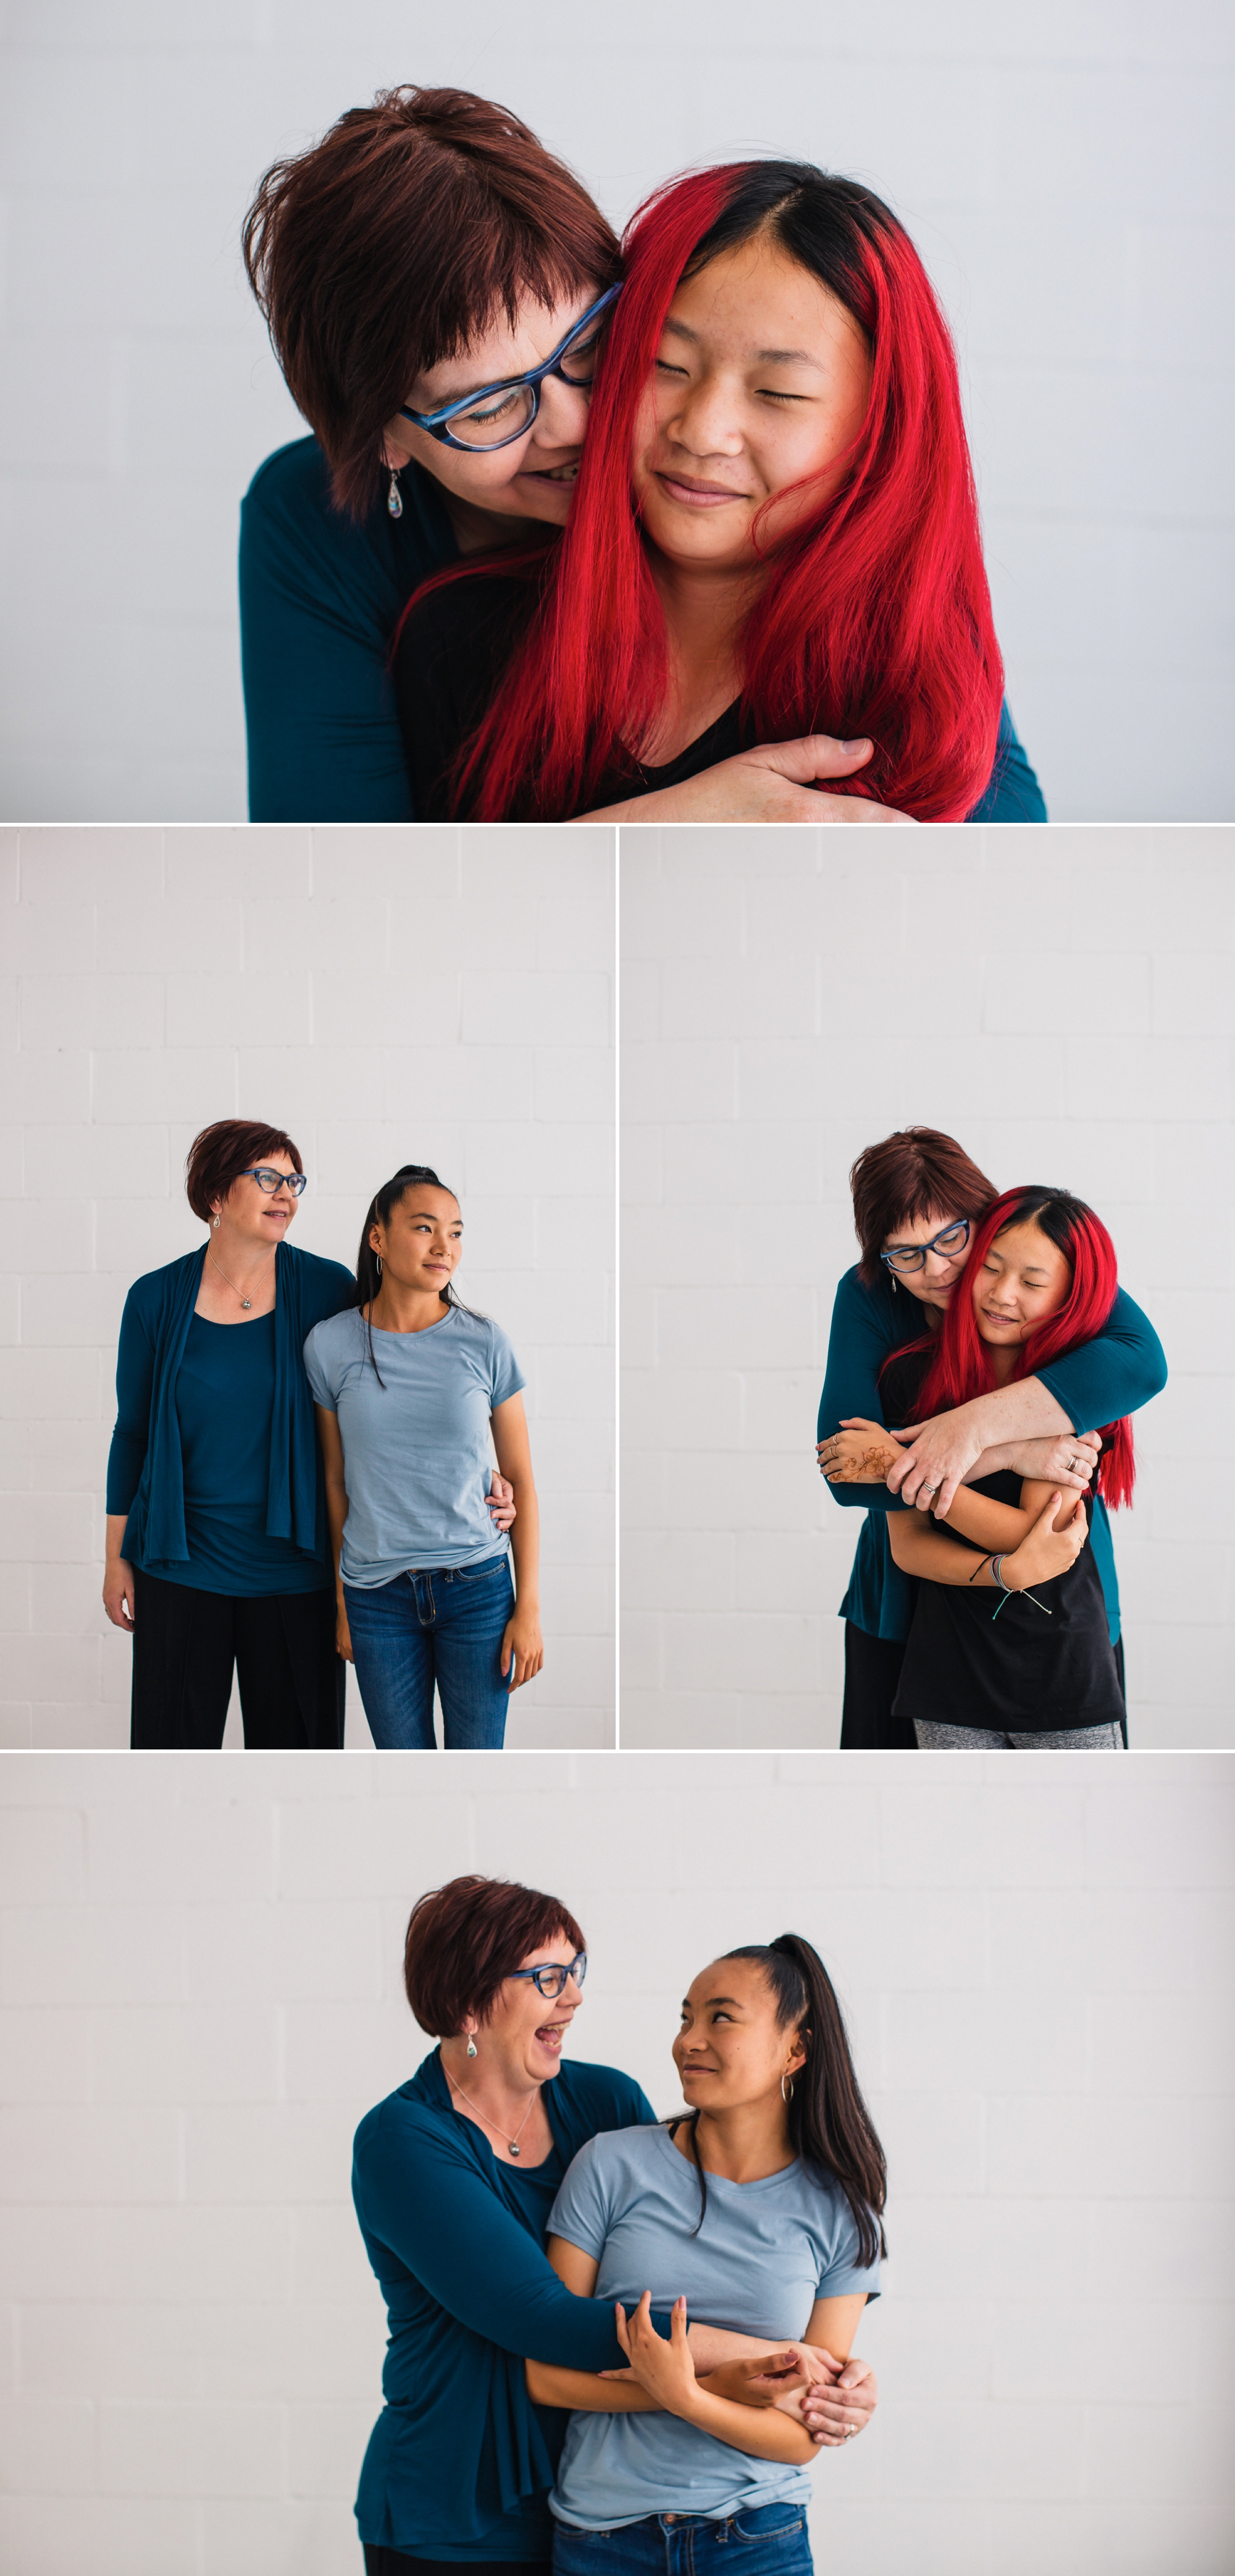 mothersdayminis 3.jpg